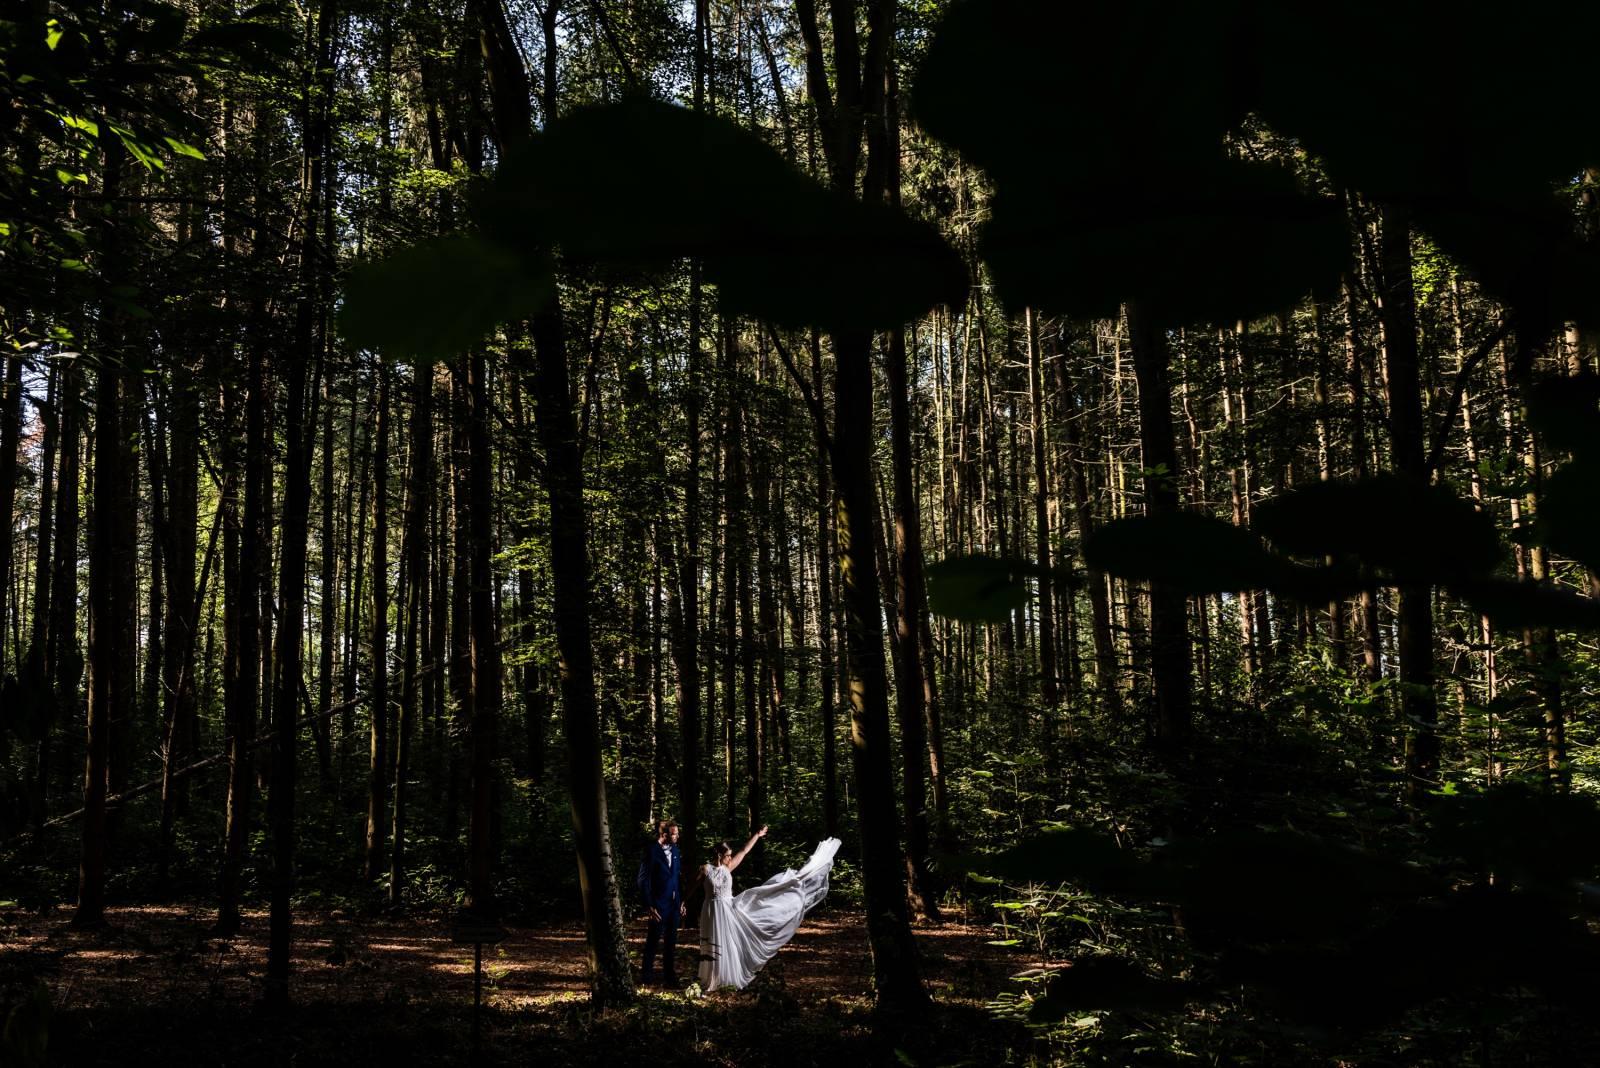 Fotografie Melody - Huwelijksfotograaf - Trouwfotograaf - House of Weddings - 15